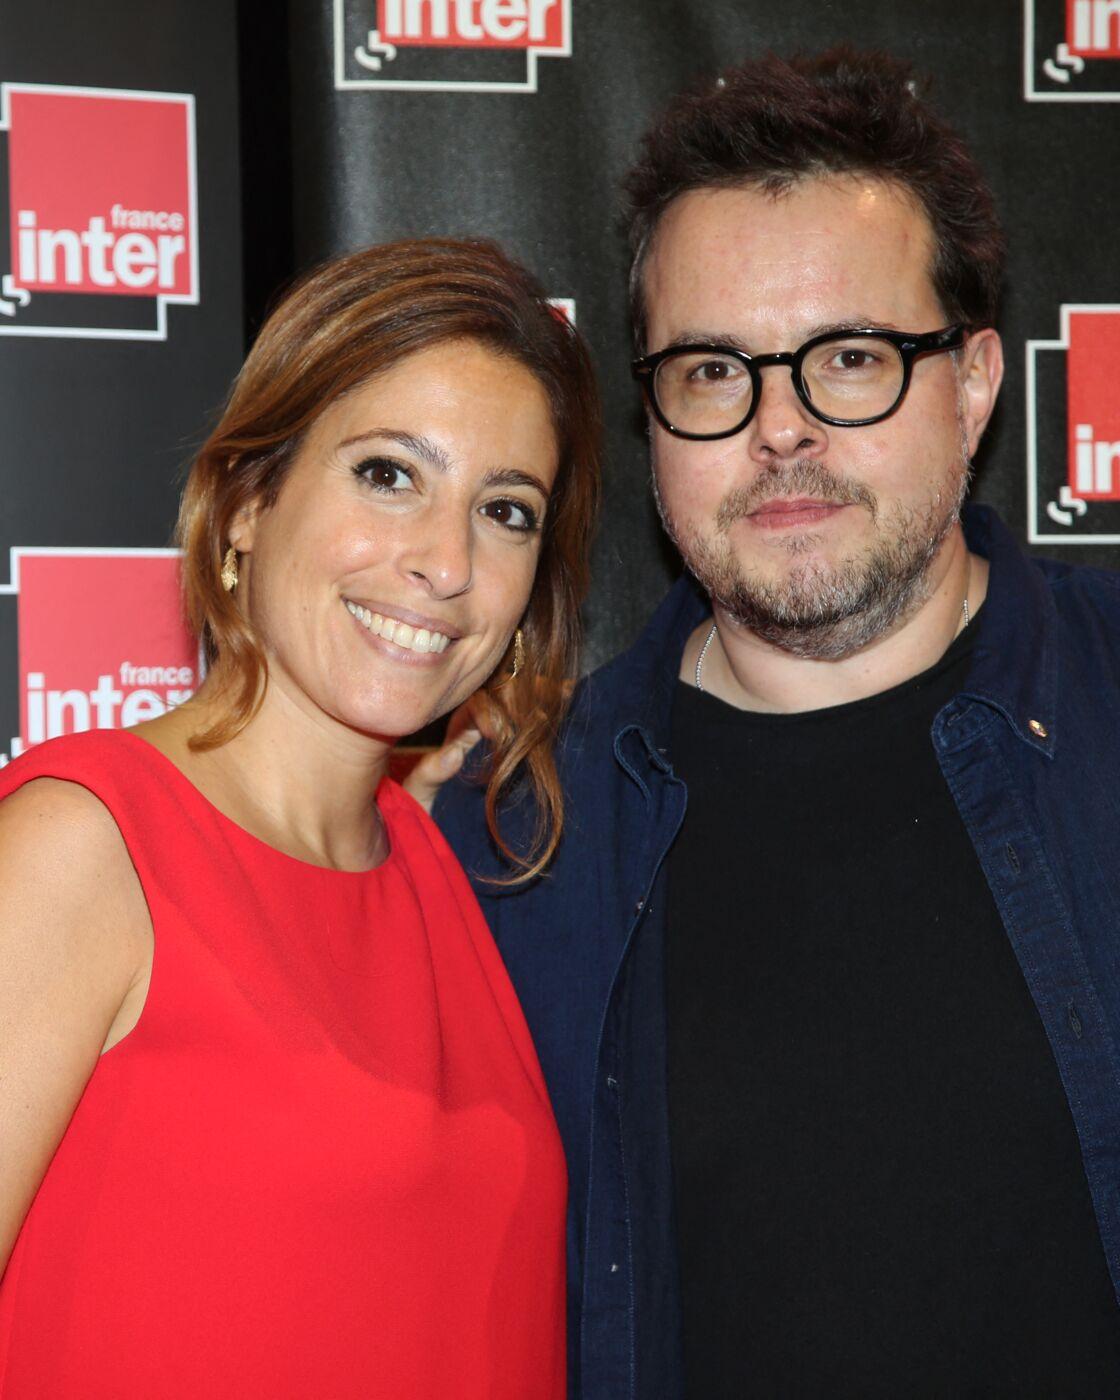 Léa Salamé et Nicolas Demorand en 2017.